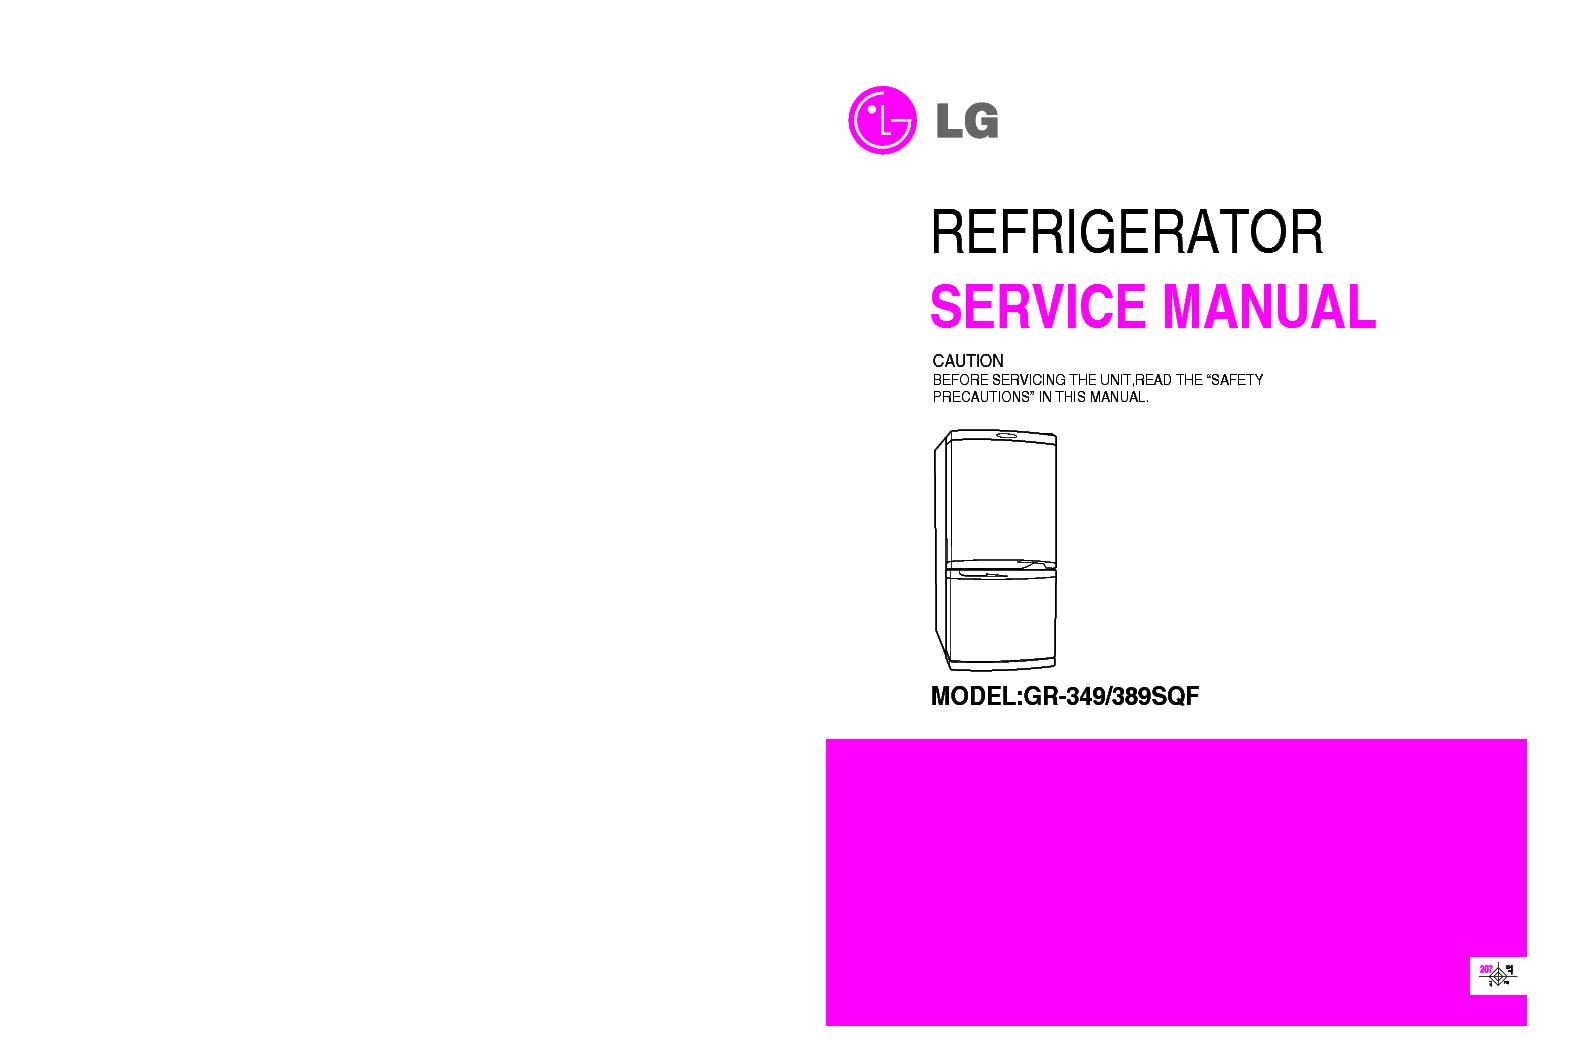 LG GR-349 389 SQF service manual (1st page)